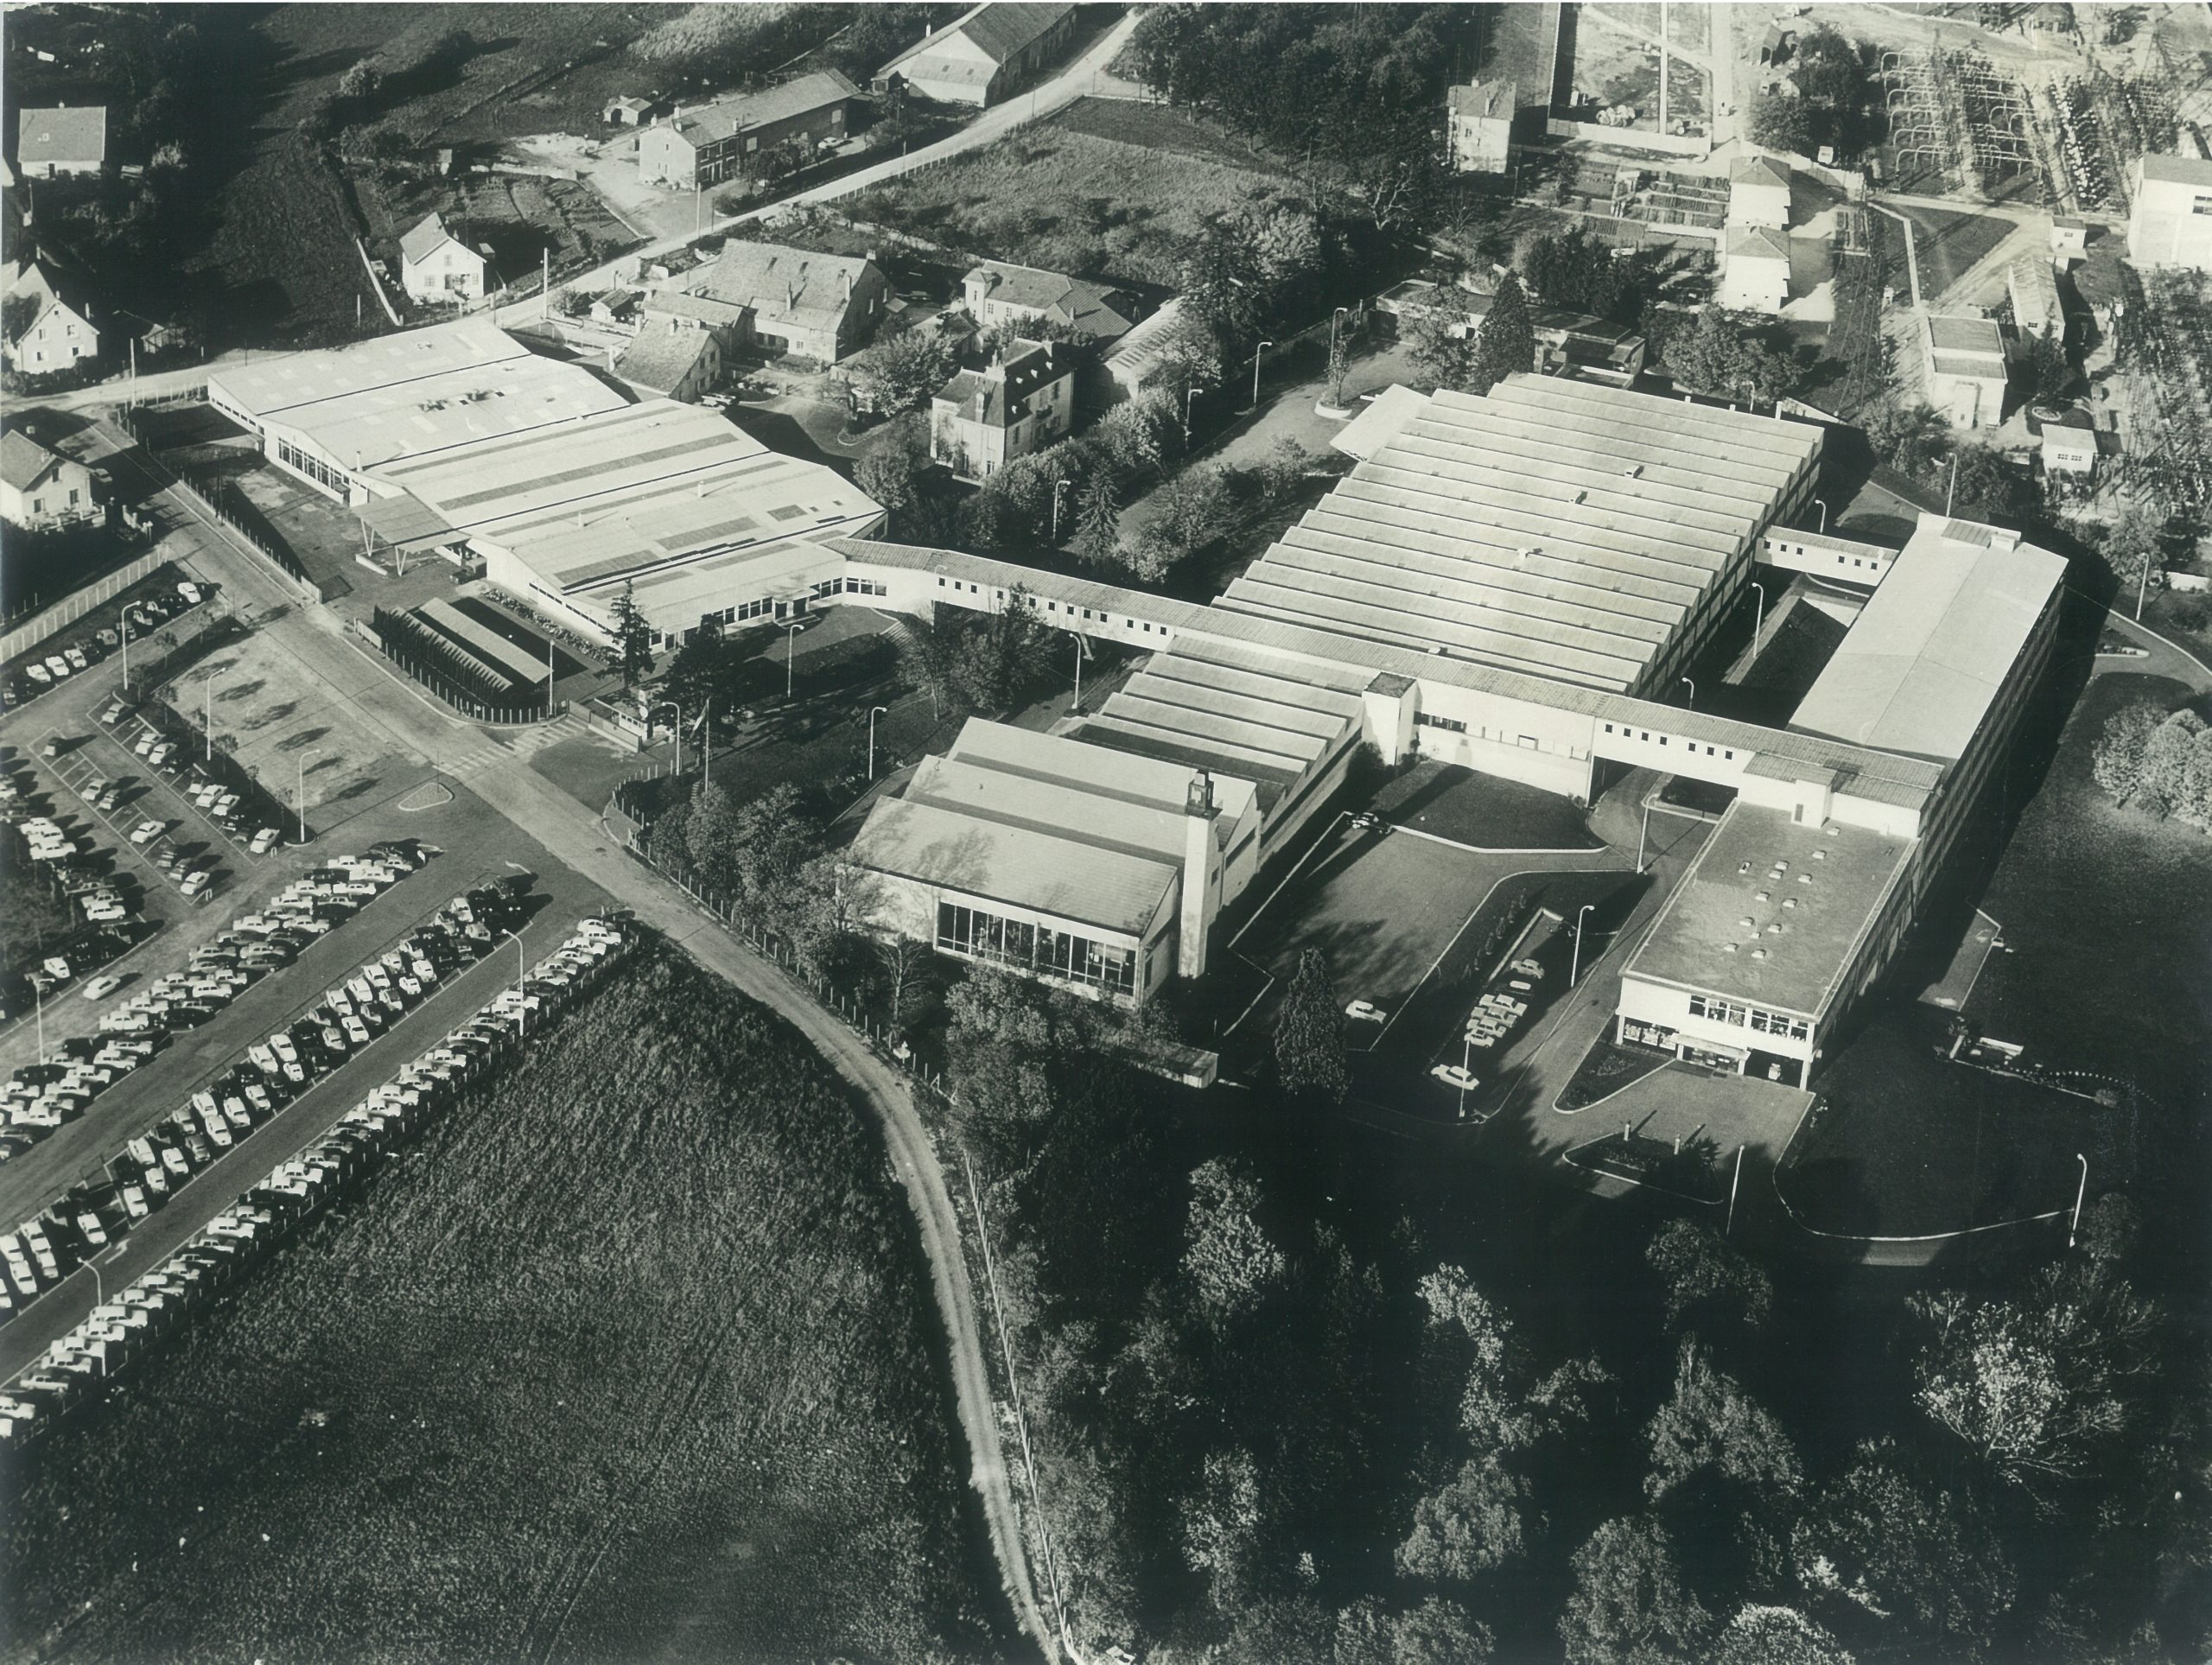 Photographie aérienne usine Lip III palente en 1967